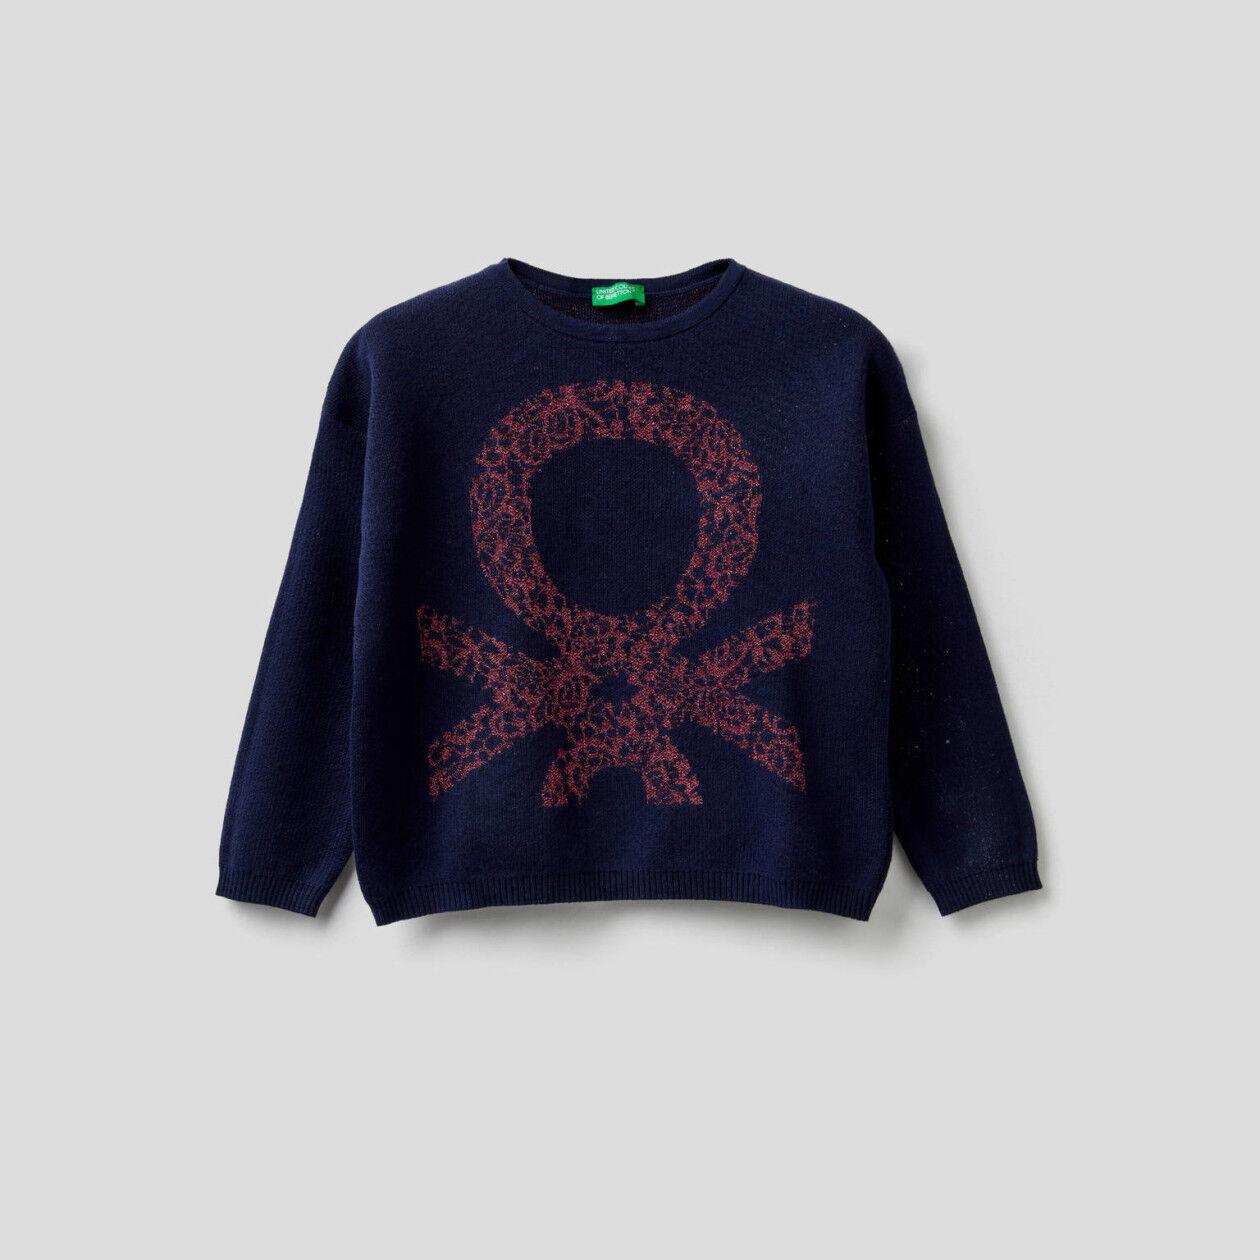 Boxy-Pullover mit Intarsienarbeit